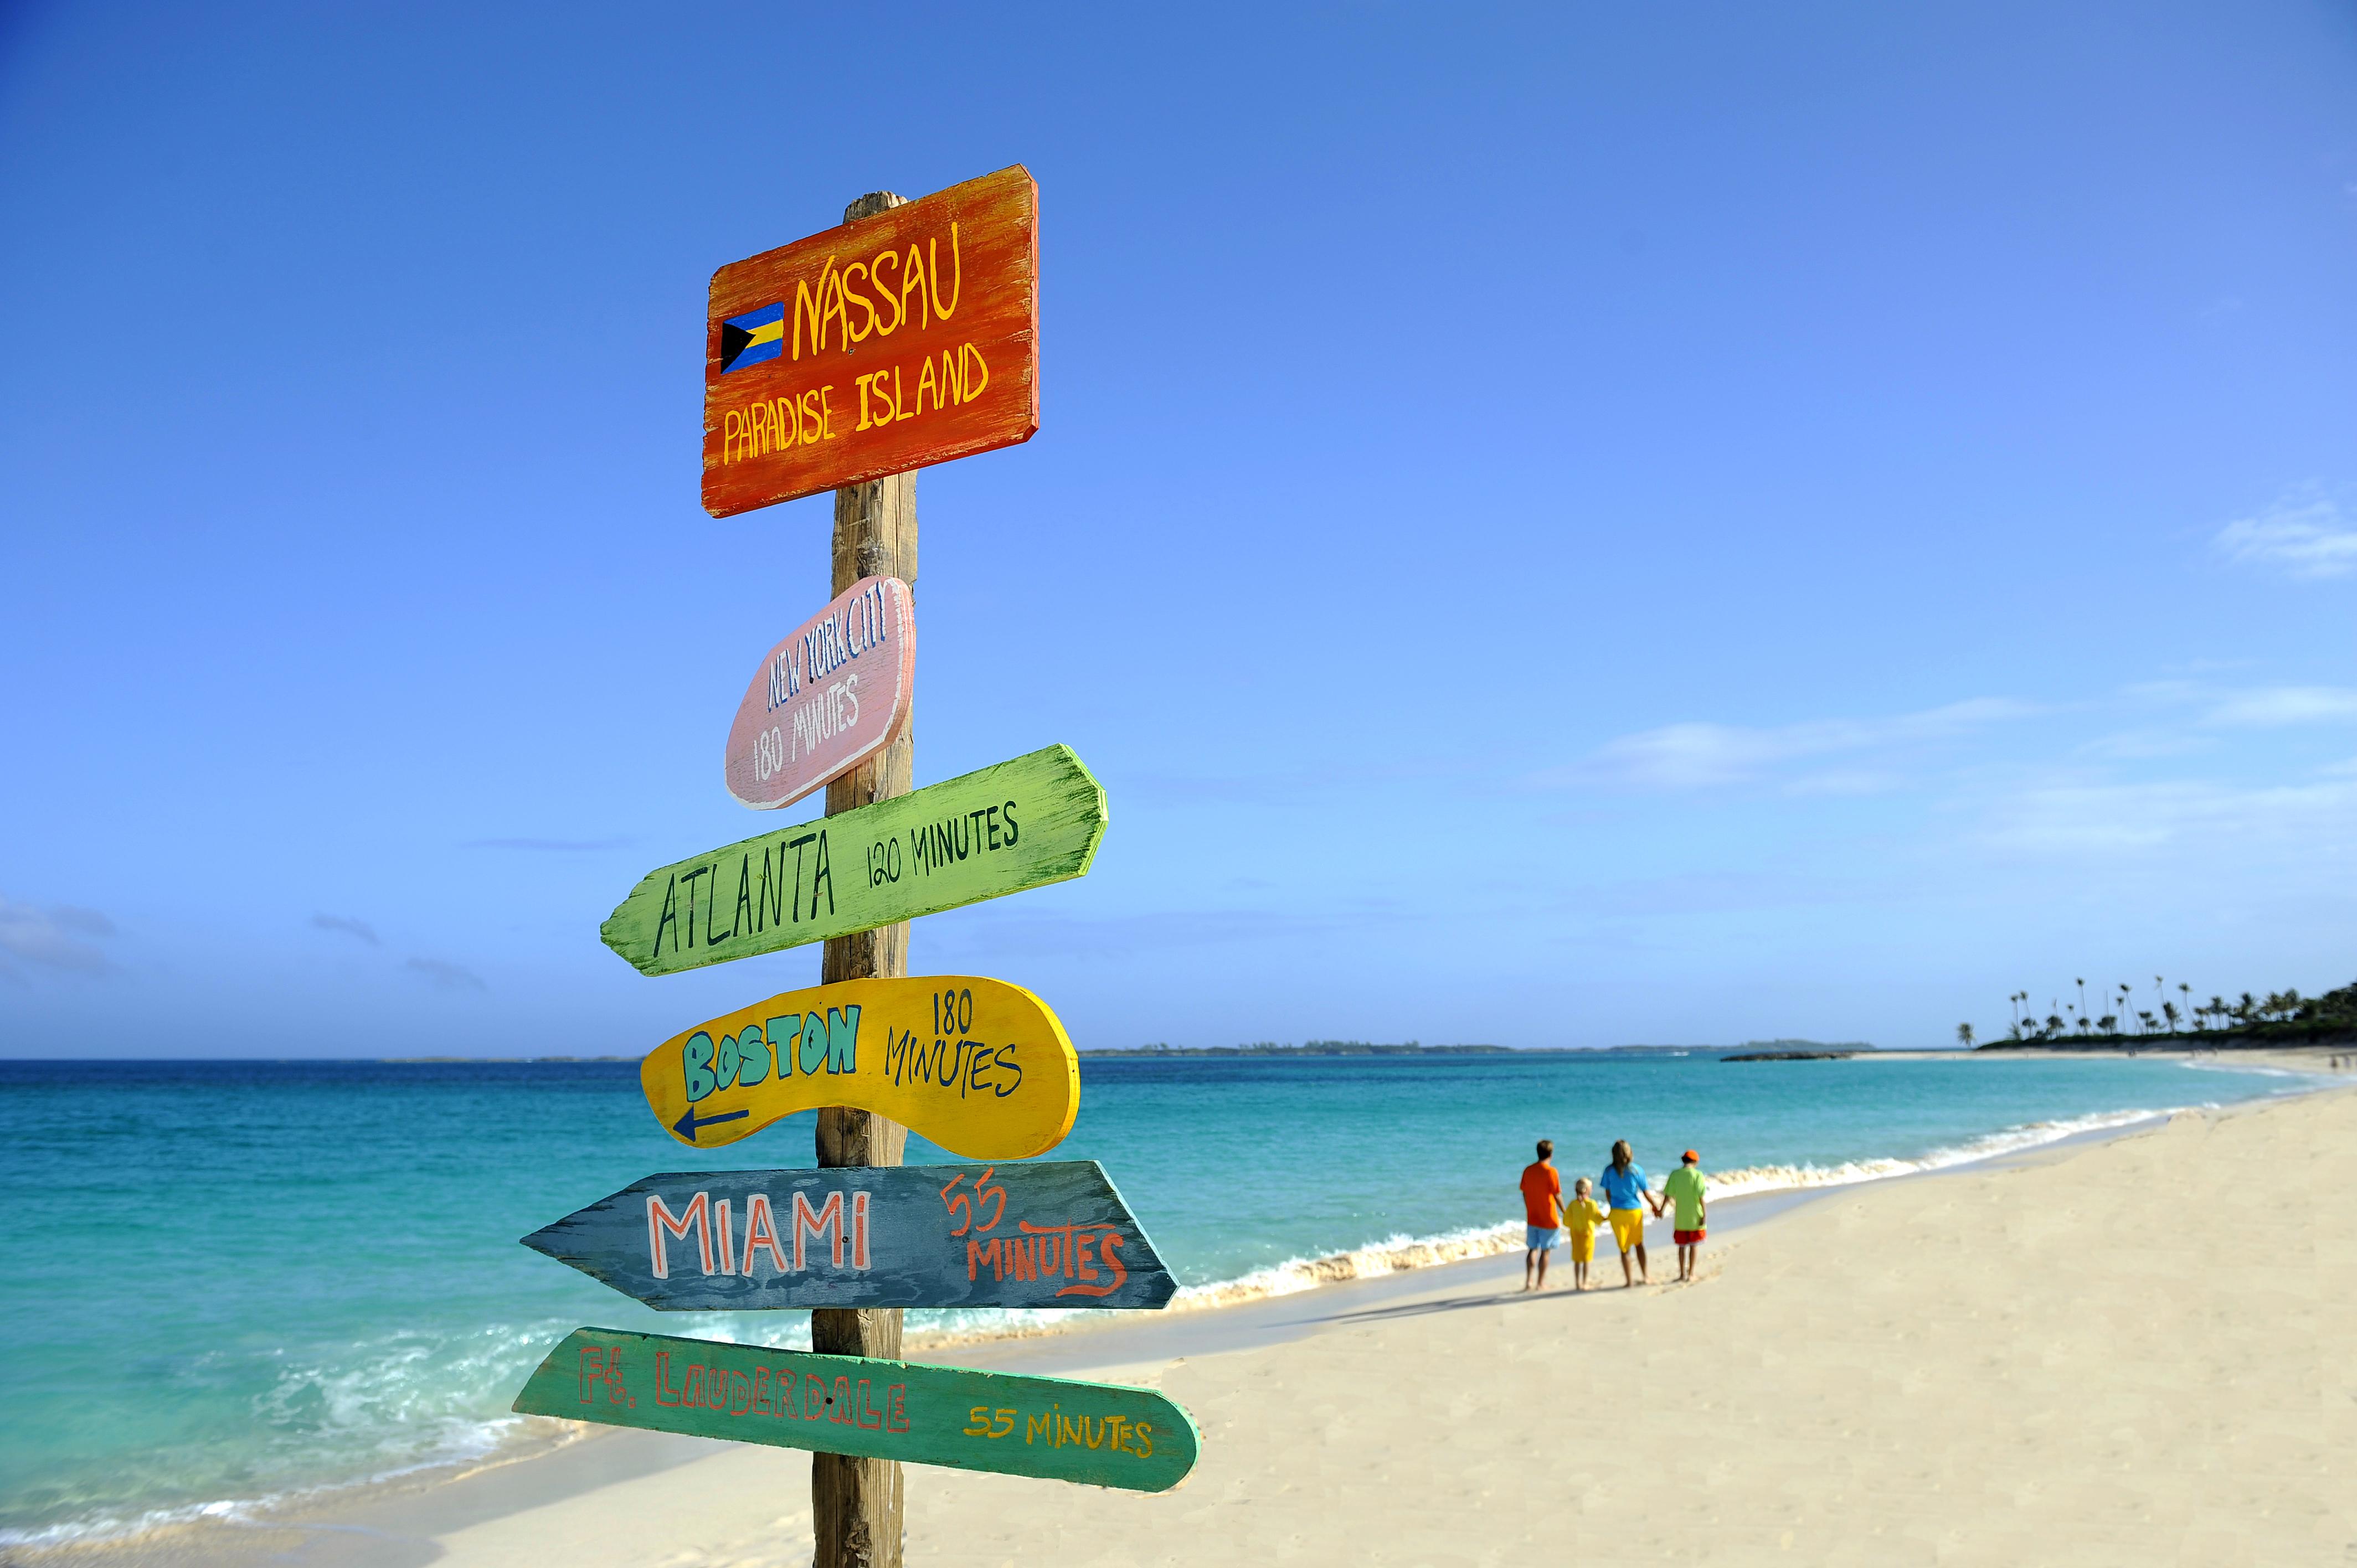 Sunrise Beach Club Paradise Island Bahamas